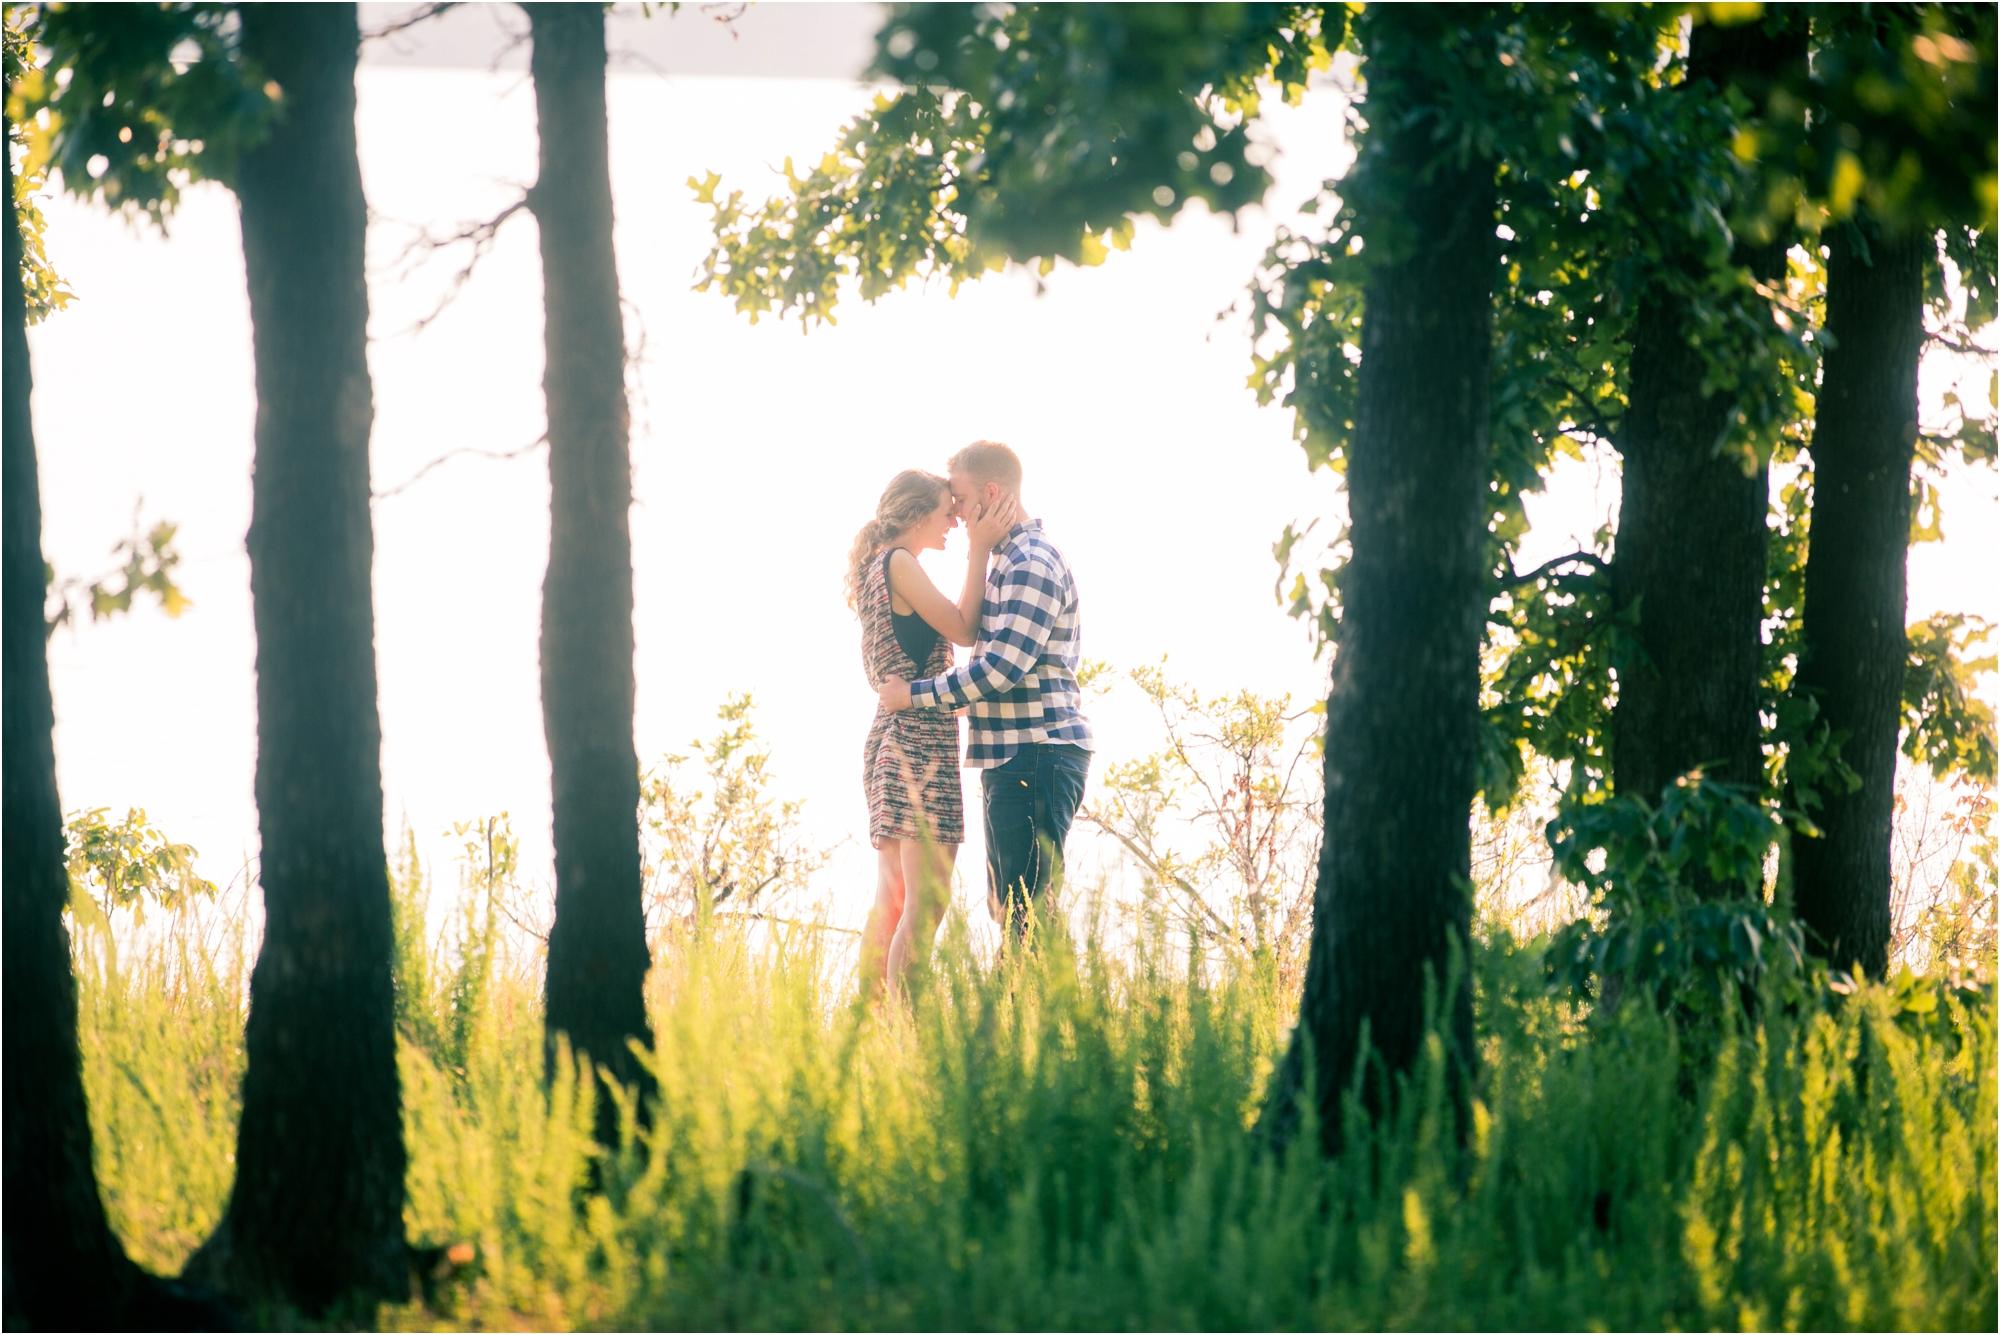 Stockton Lake Proposal - Jordan Brittley Photography